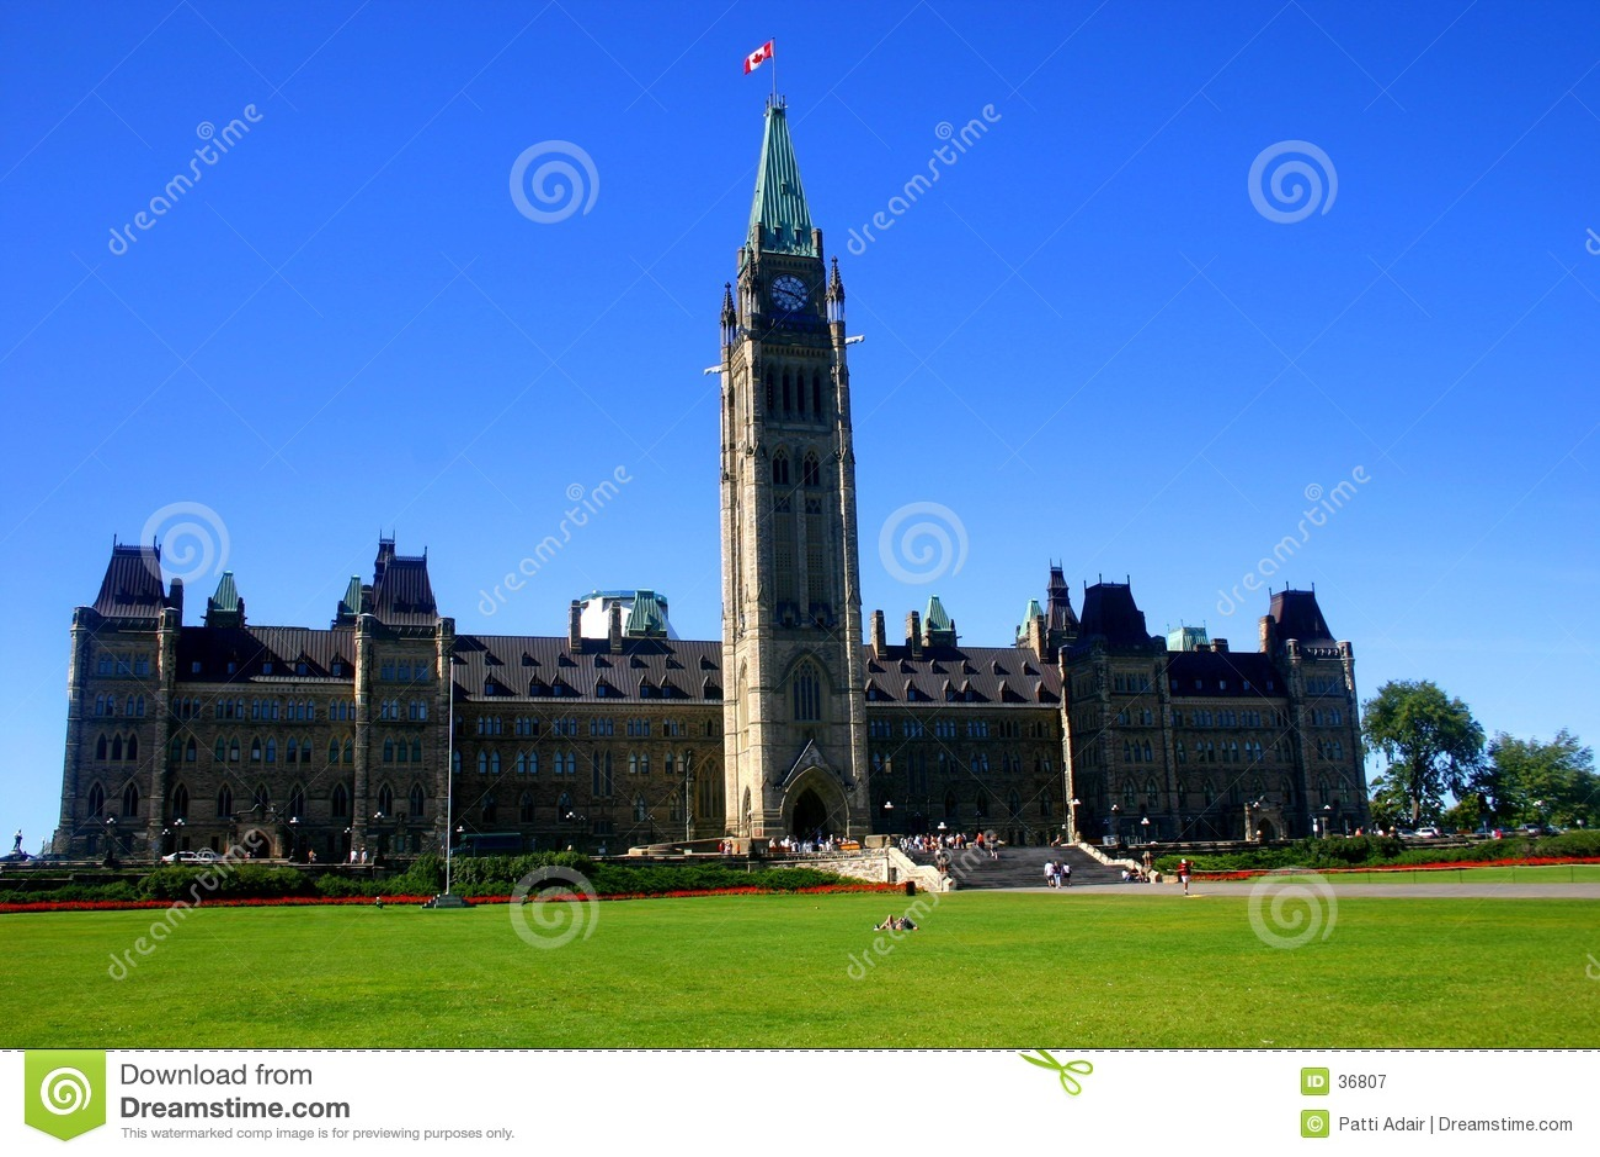 Parlament jest canada